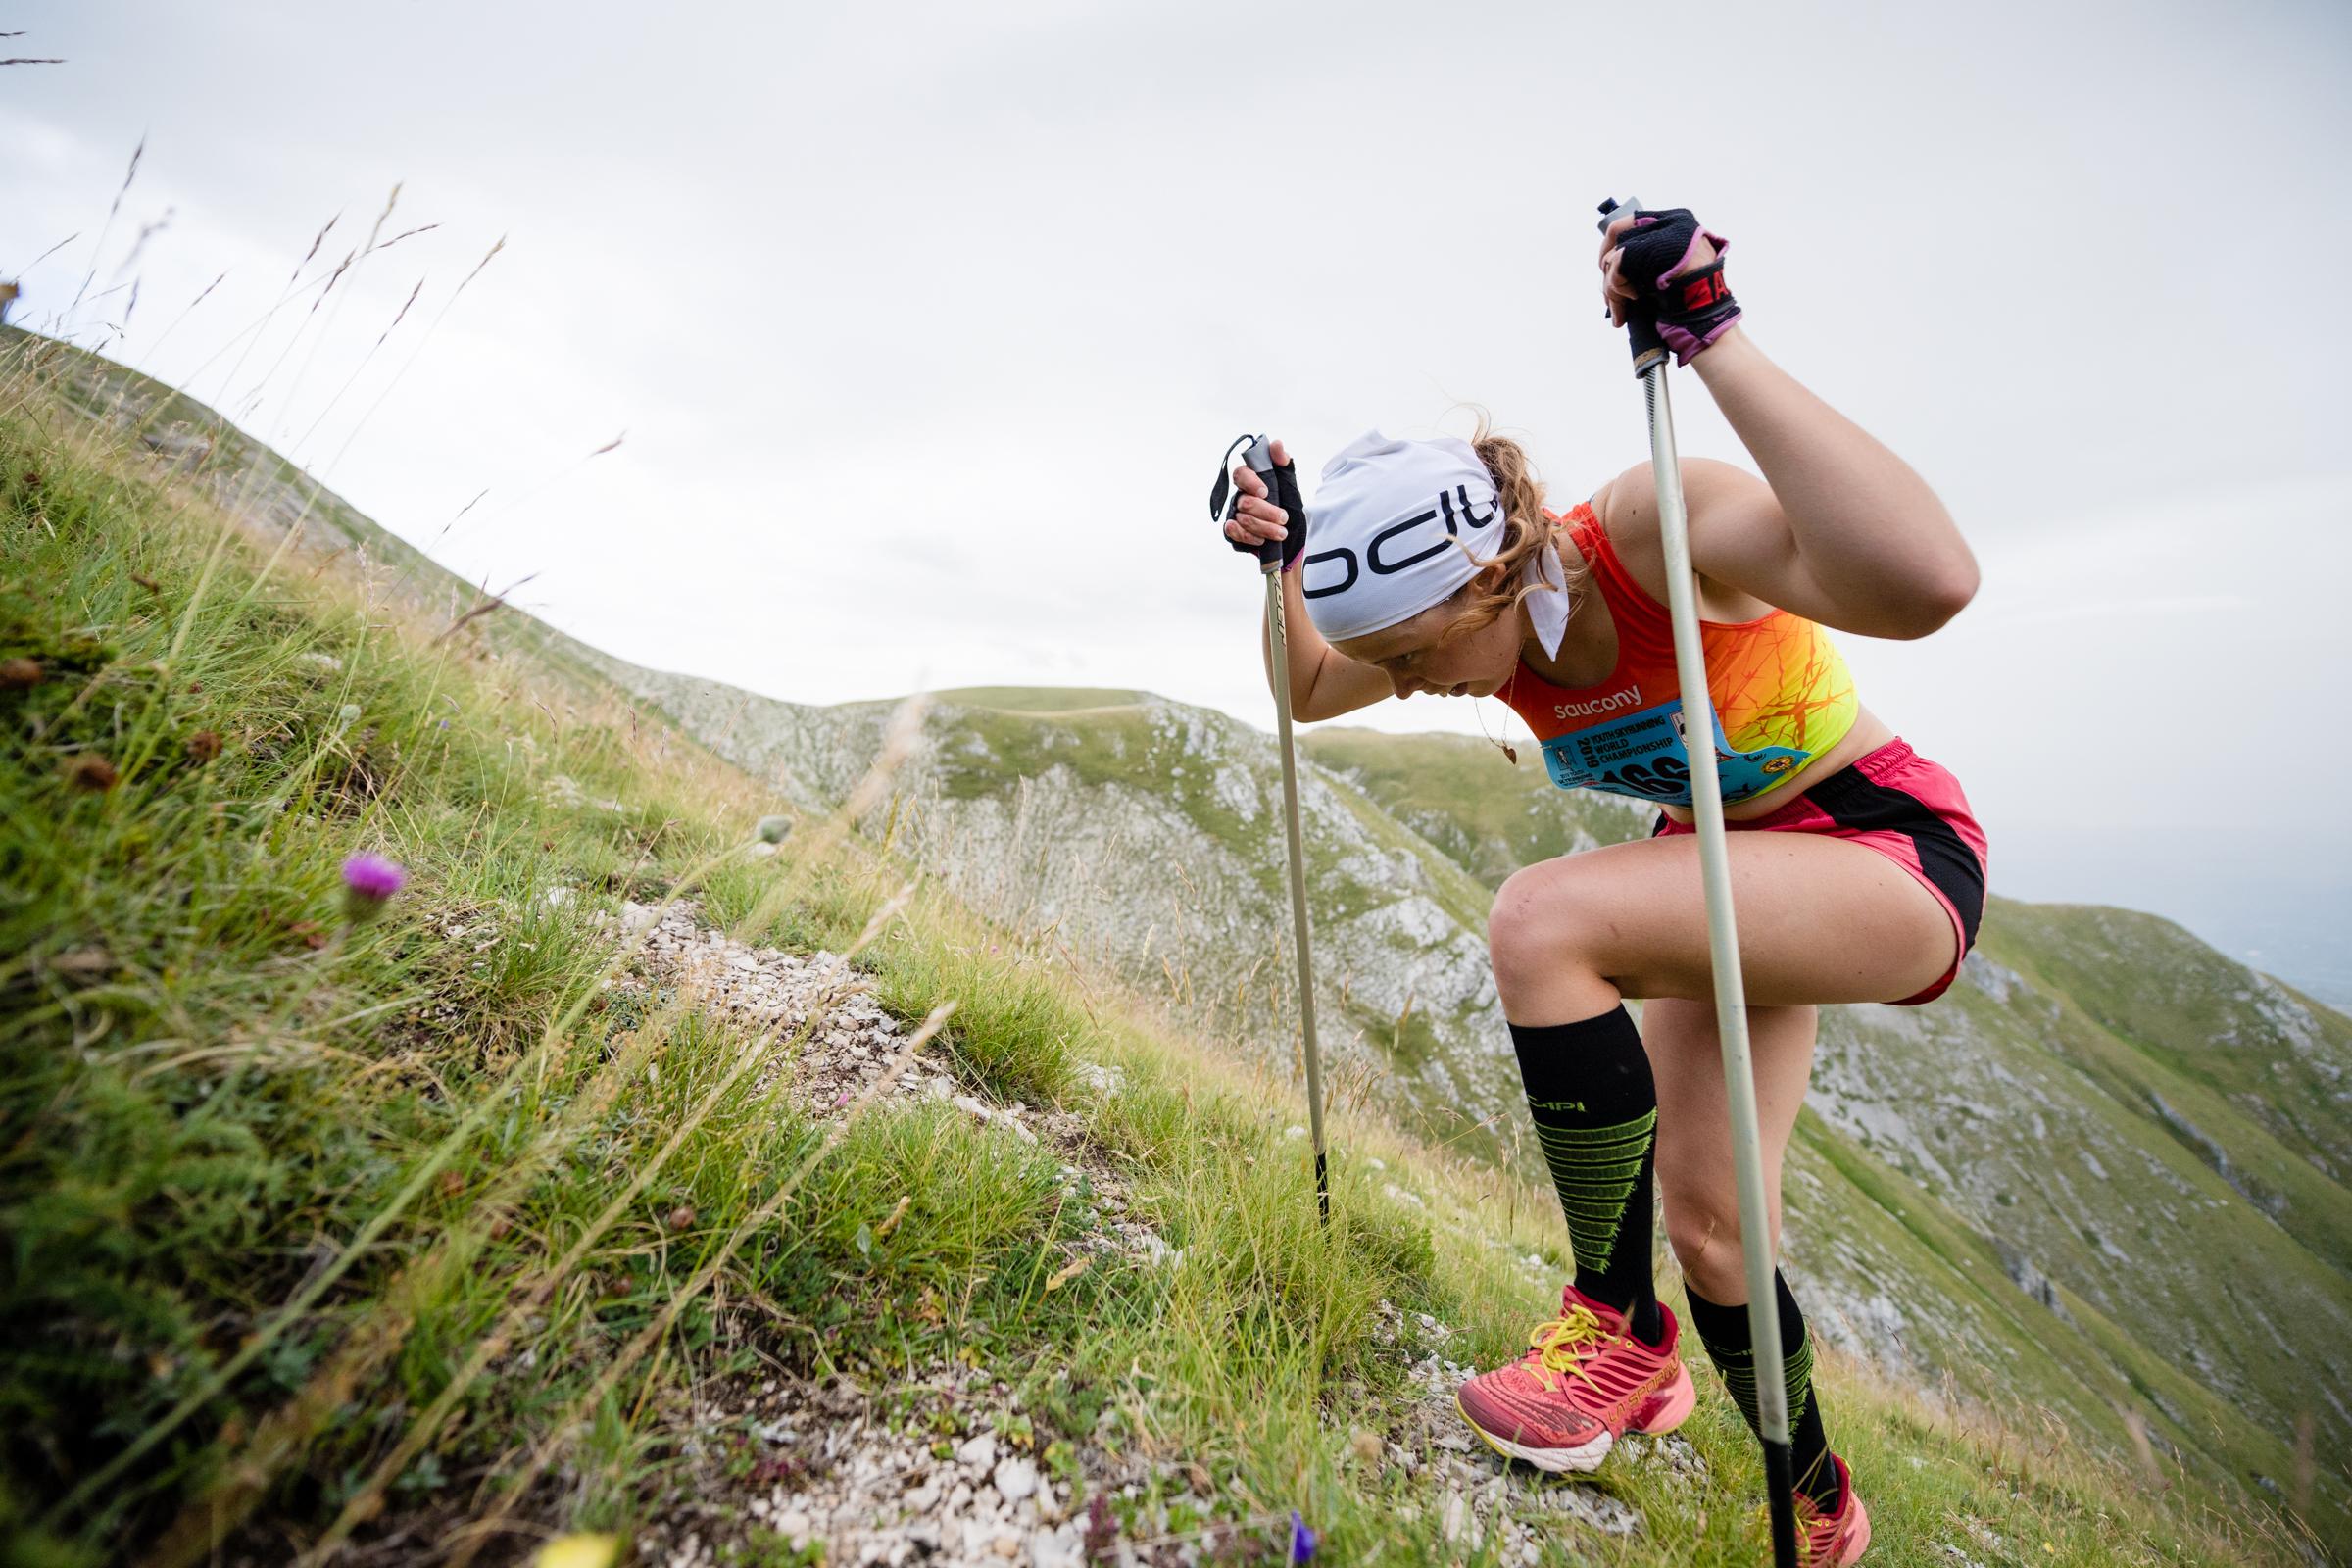 SKIMO(山岳スキー)のジュニアチャンピオンのエカテリーナも初参戦 ©NAGI MUROFUSHI